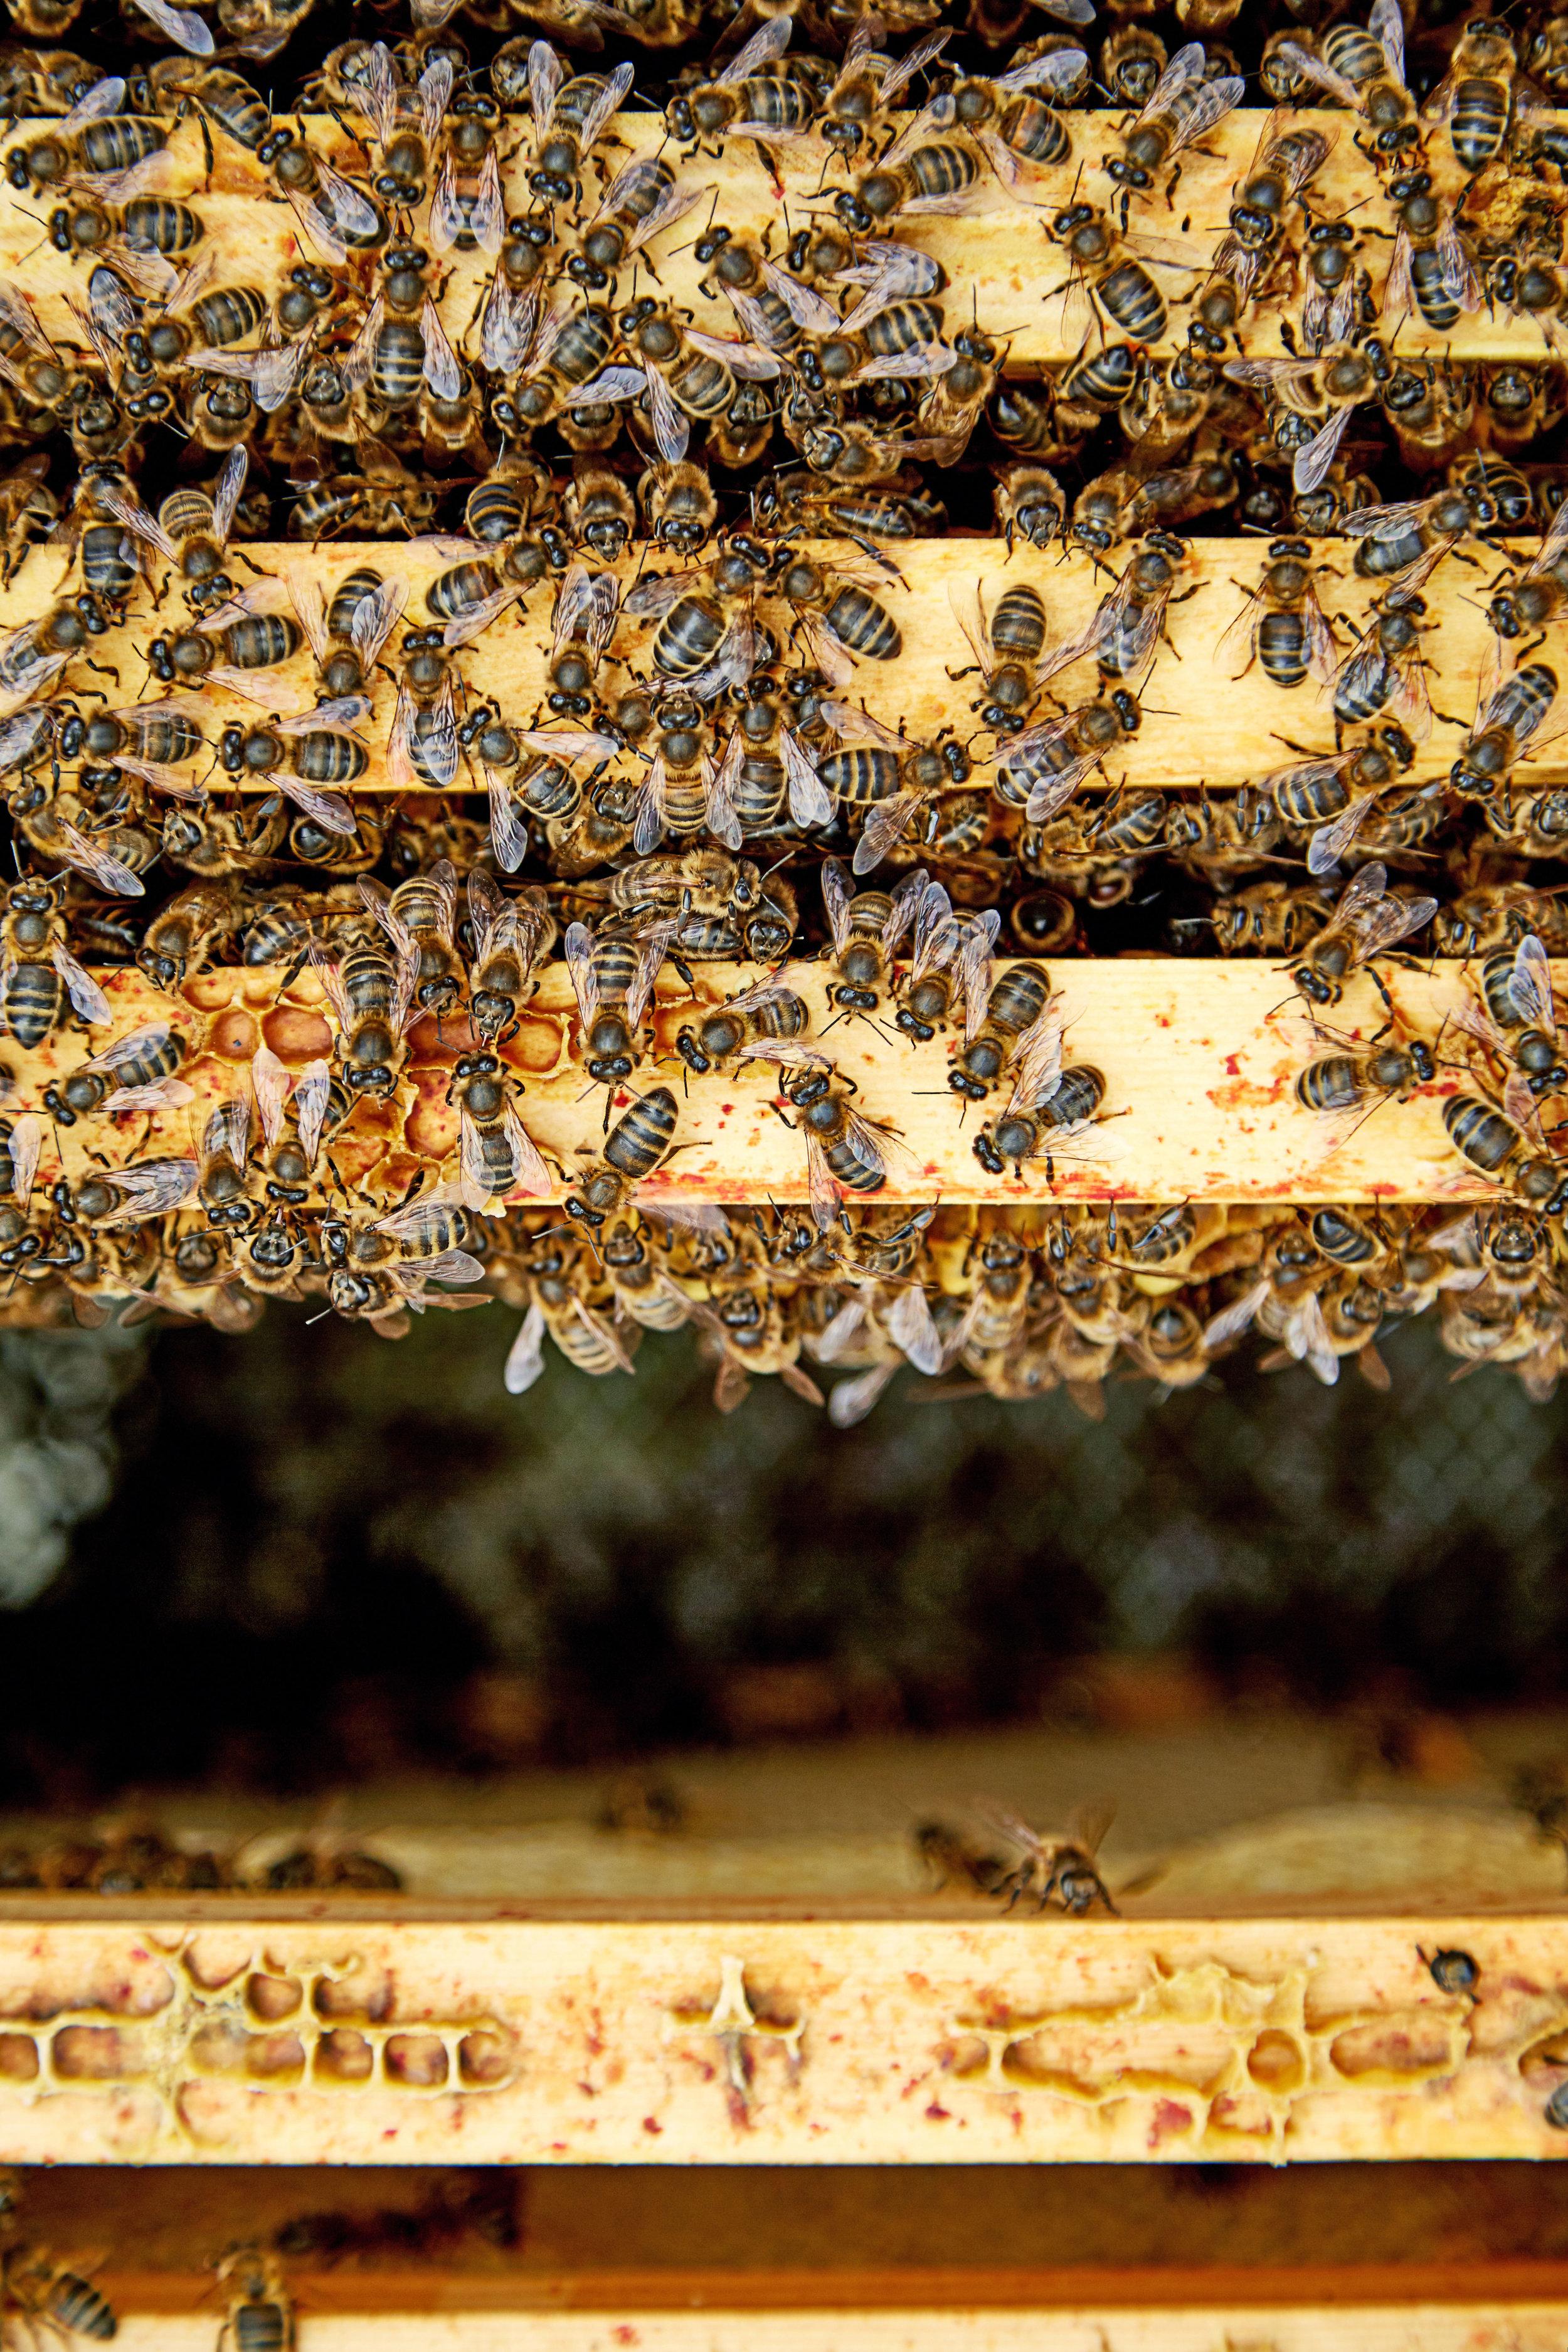 Bee-hive-overhead.jpg